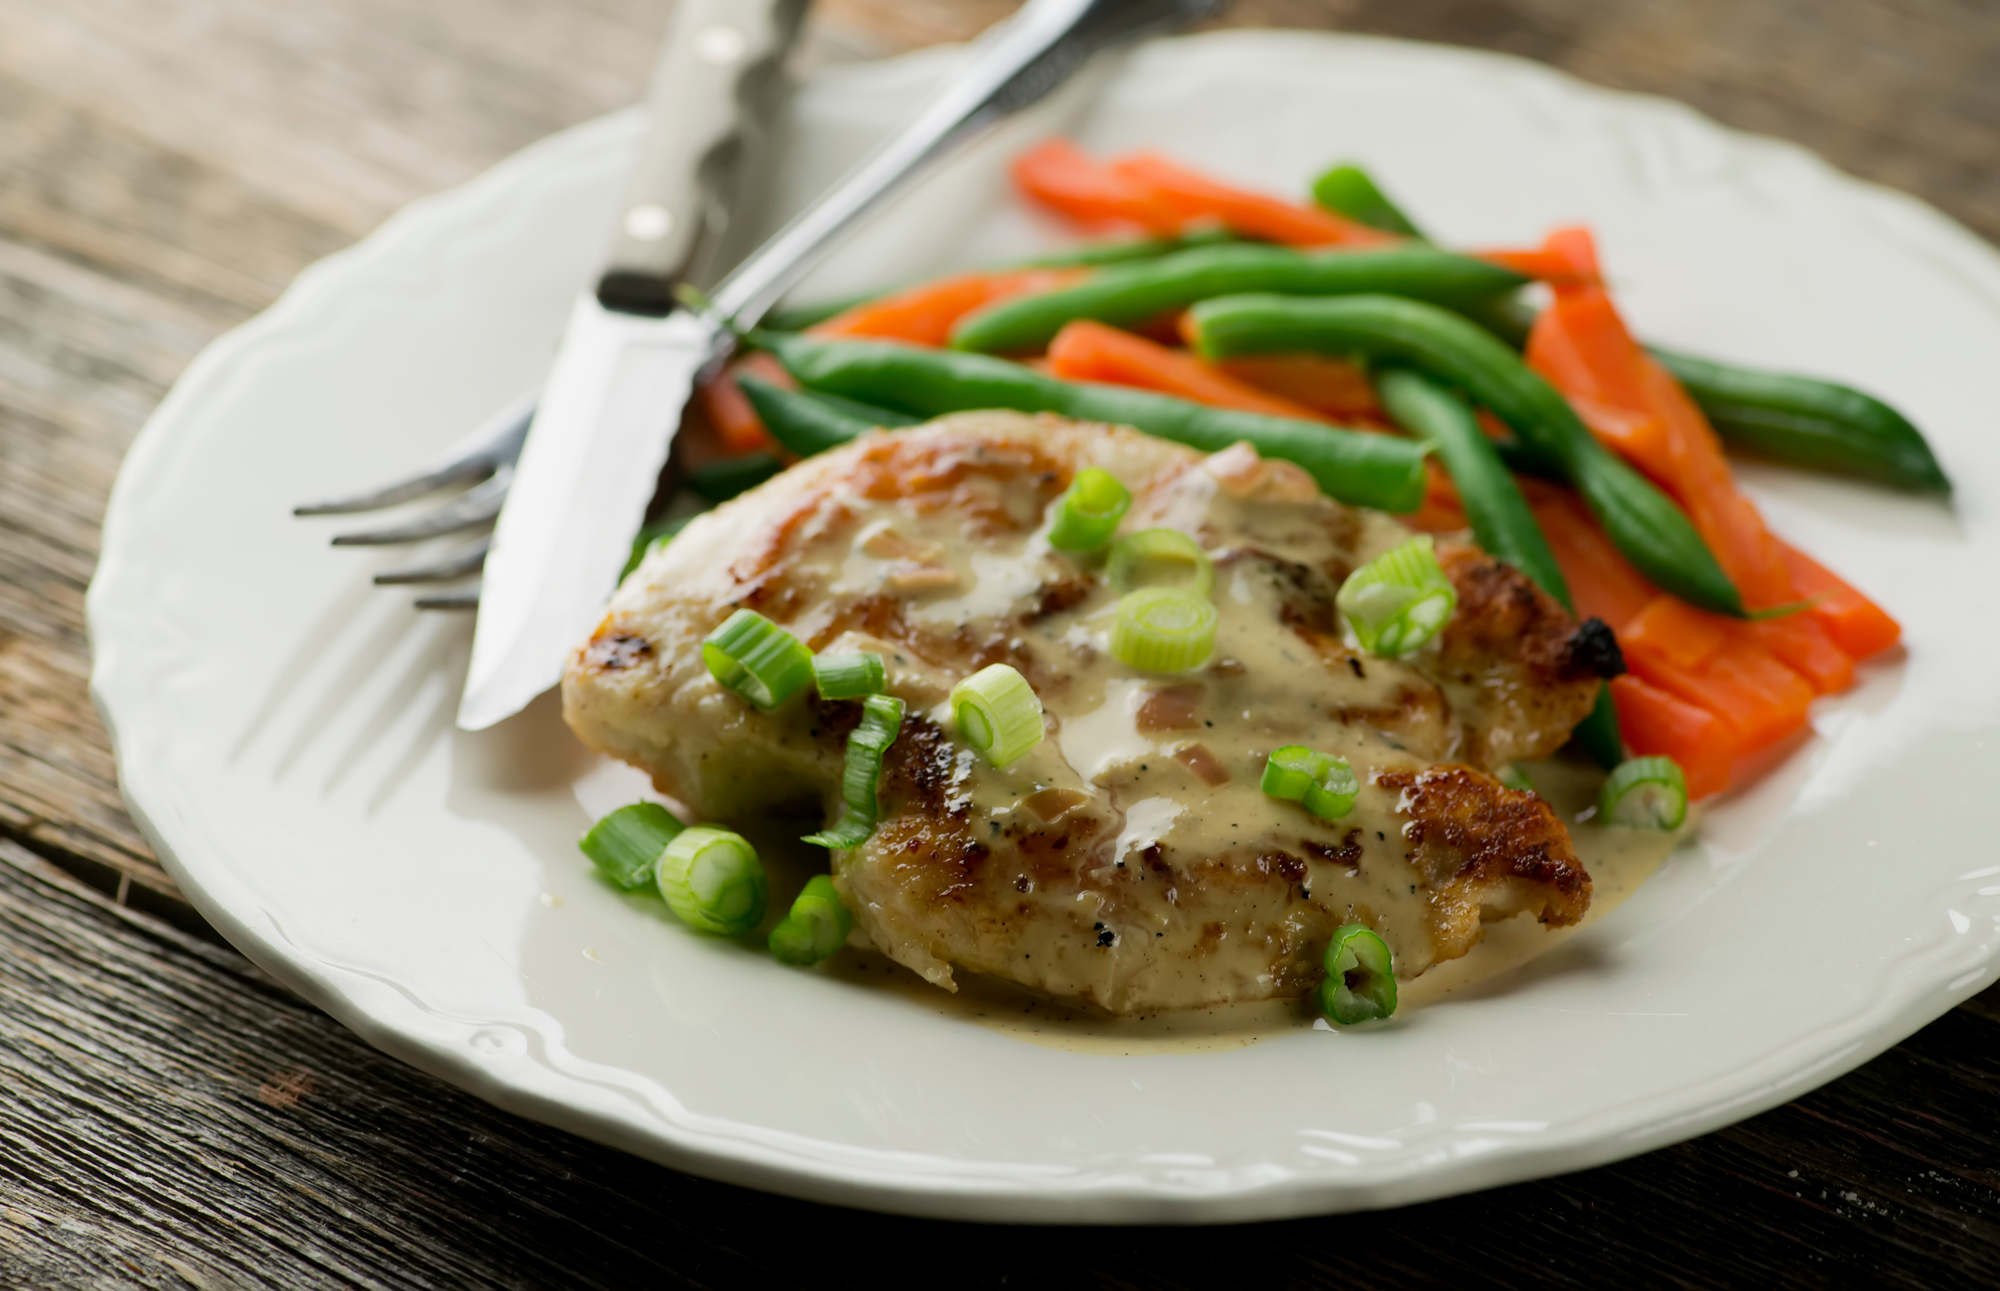 Breast of chicken in cream sauce